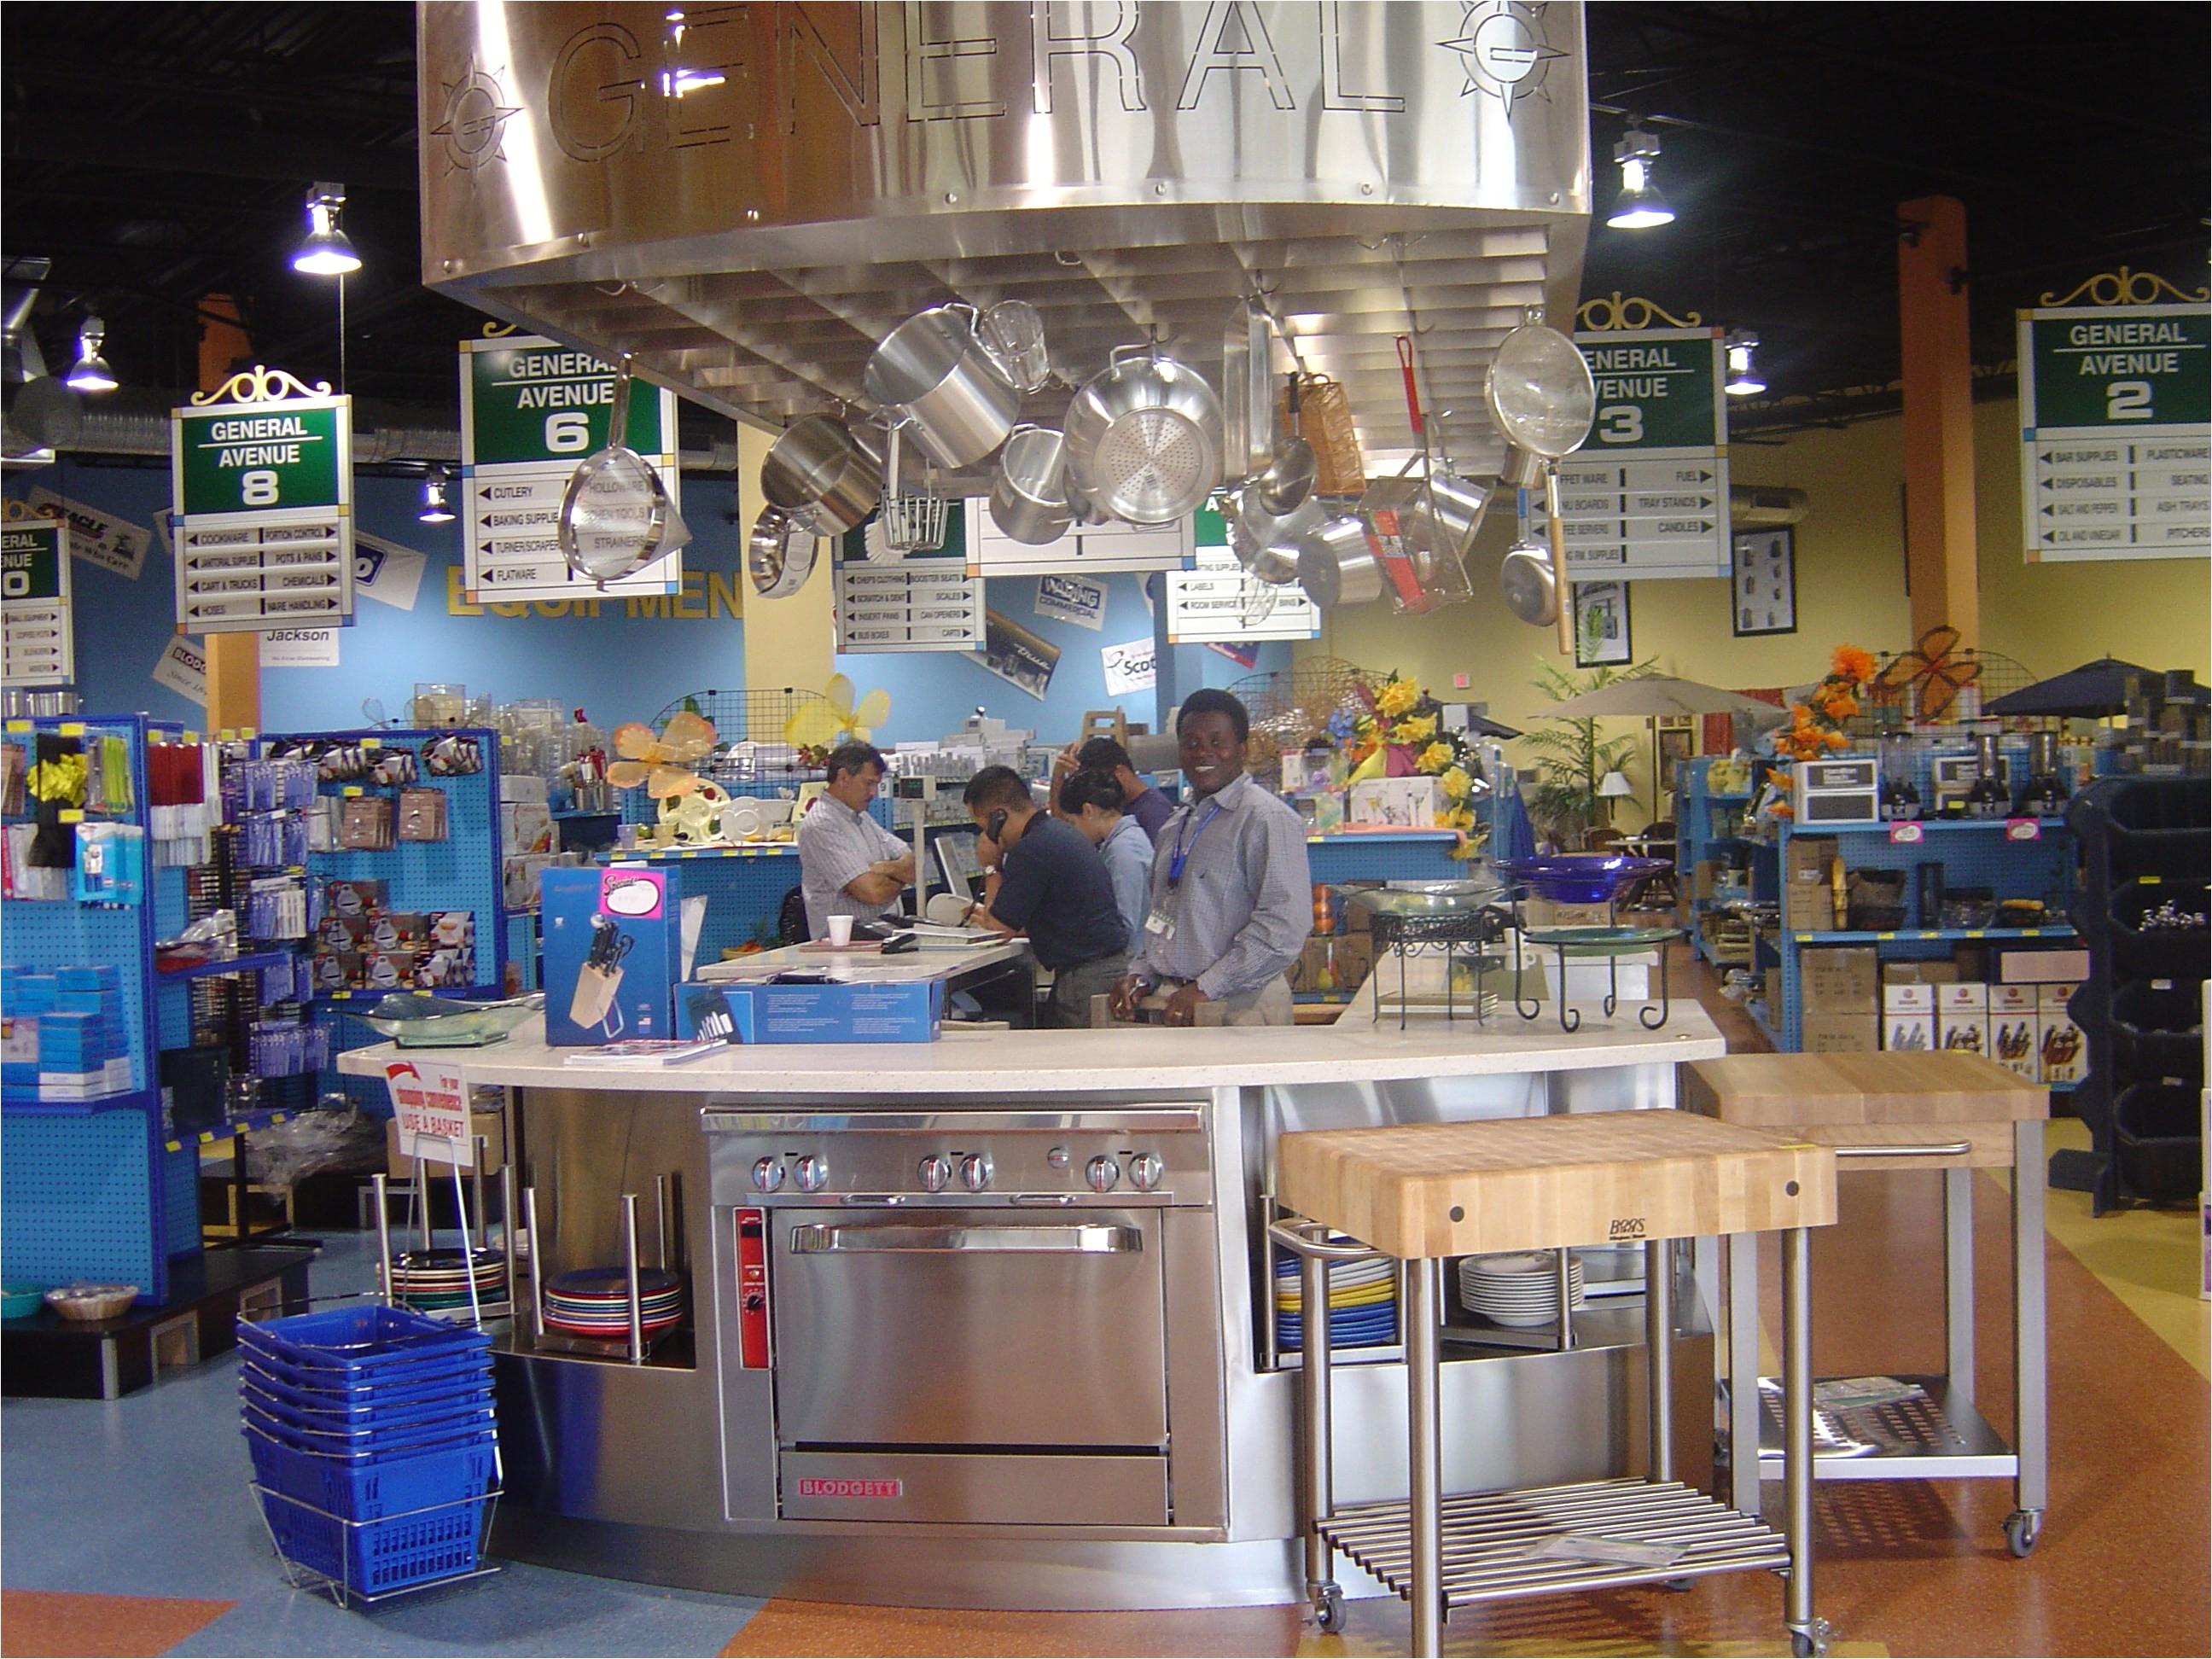 Kitchen Supply Stores | Party Supply Store Louisville Kentucky Kitchen Supply Store Winning